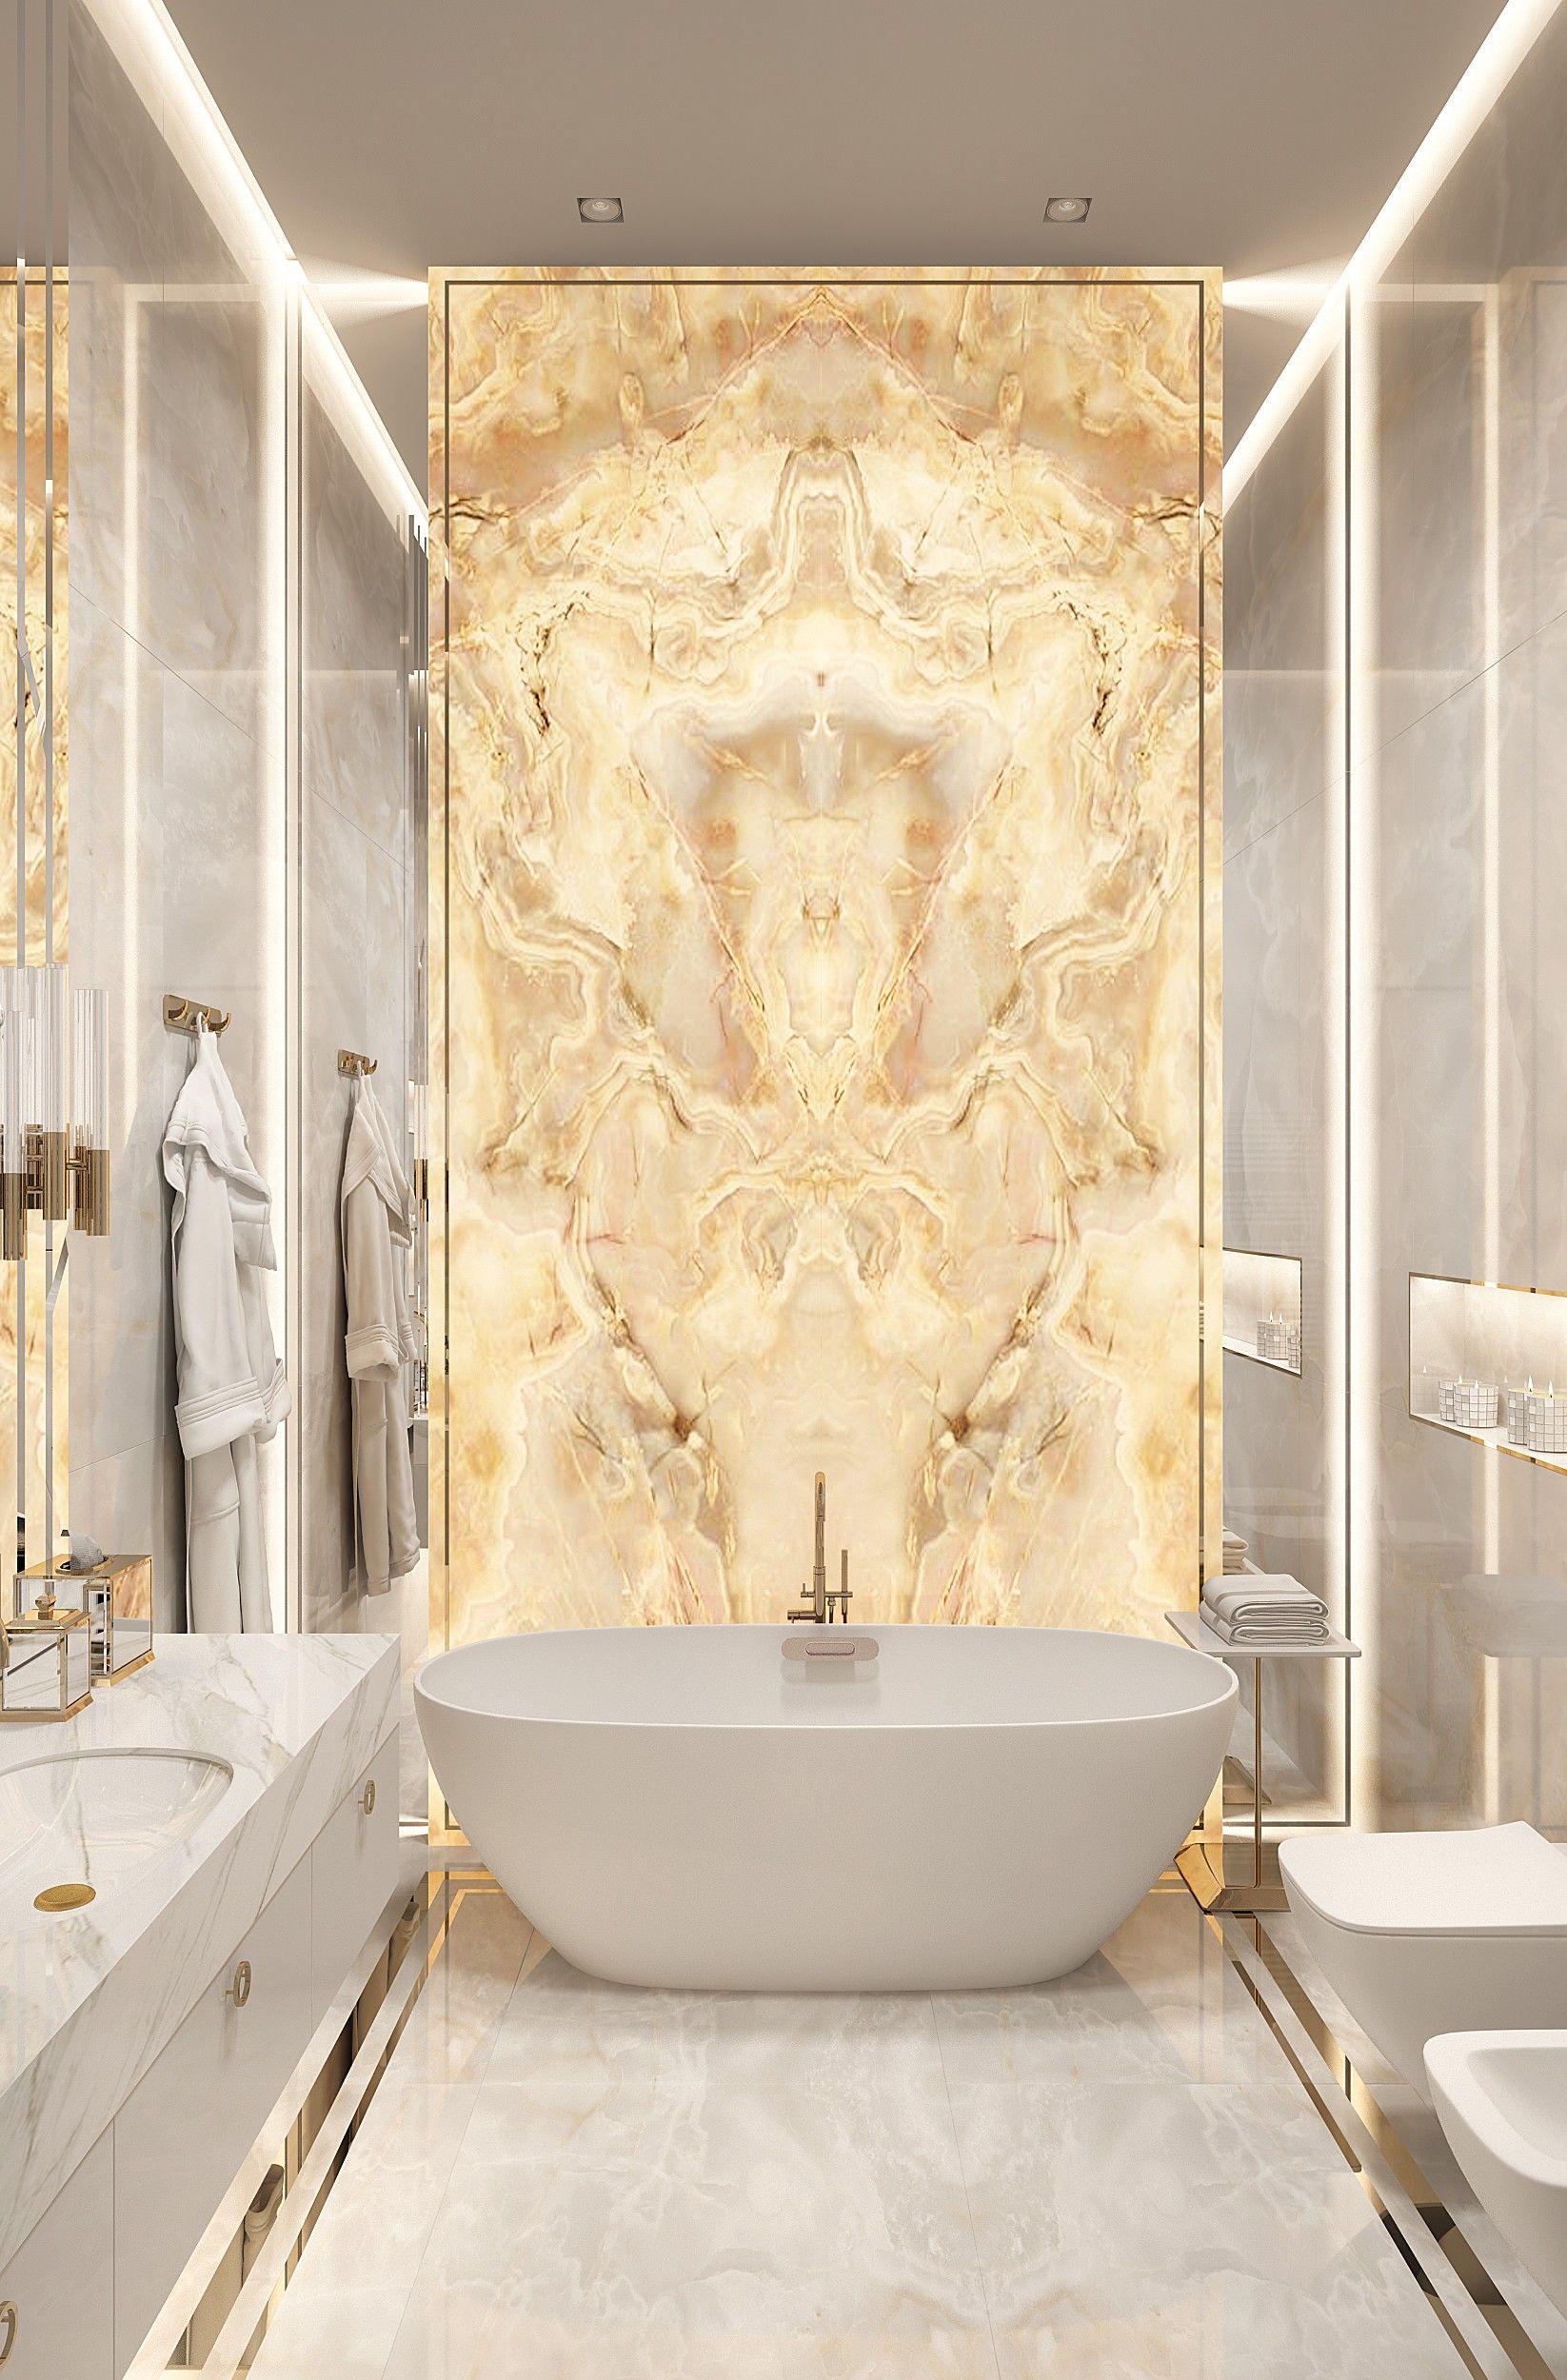 Botanical bathroom mobilia interior modern master home design also pin by mayra ruiz on decor in rh pinterest